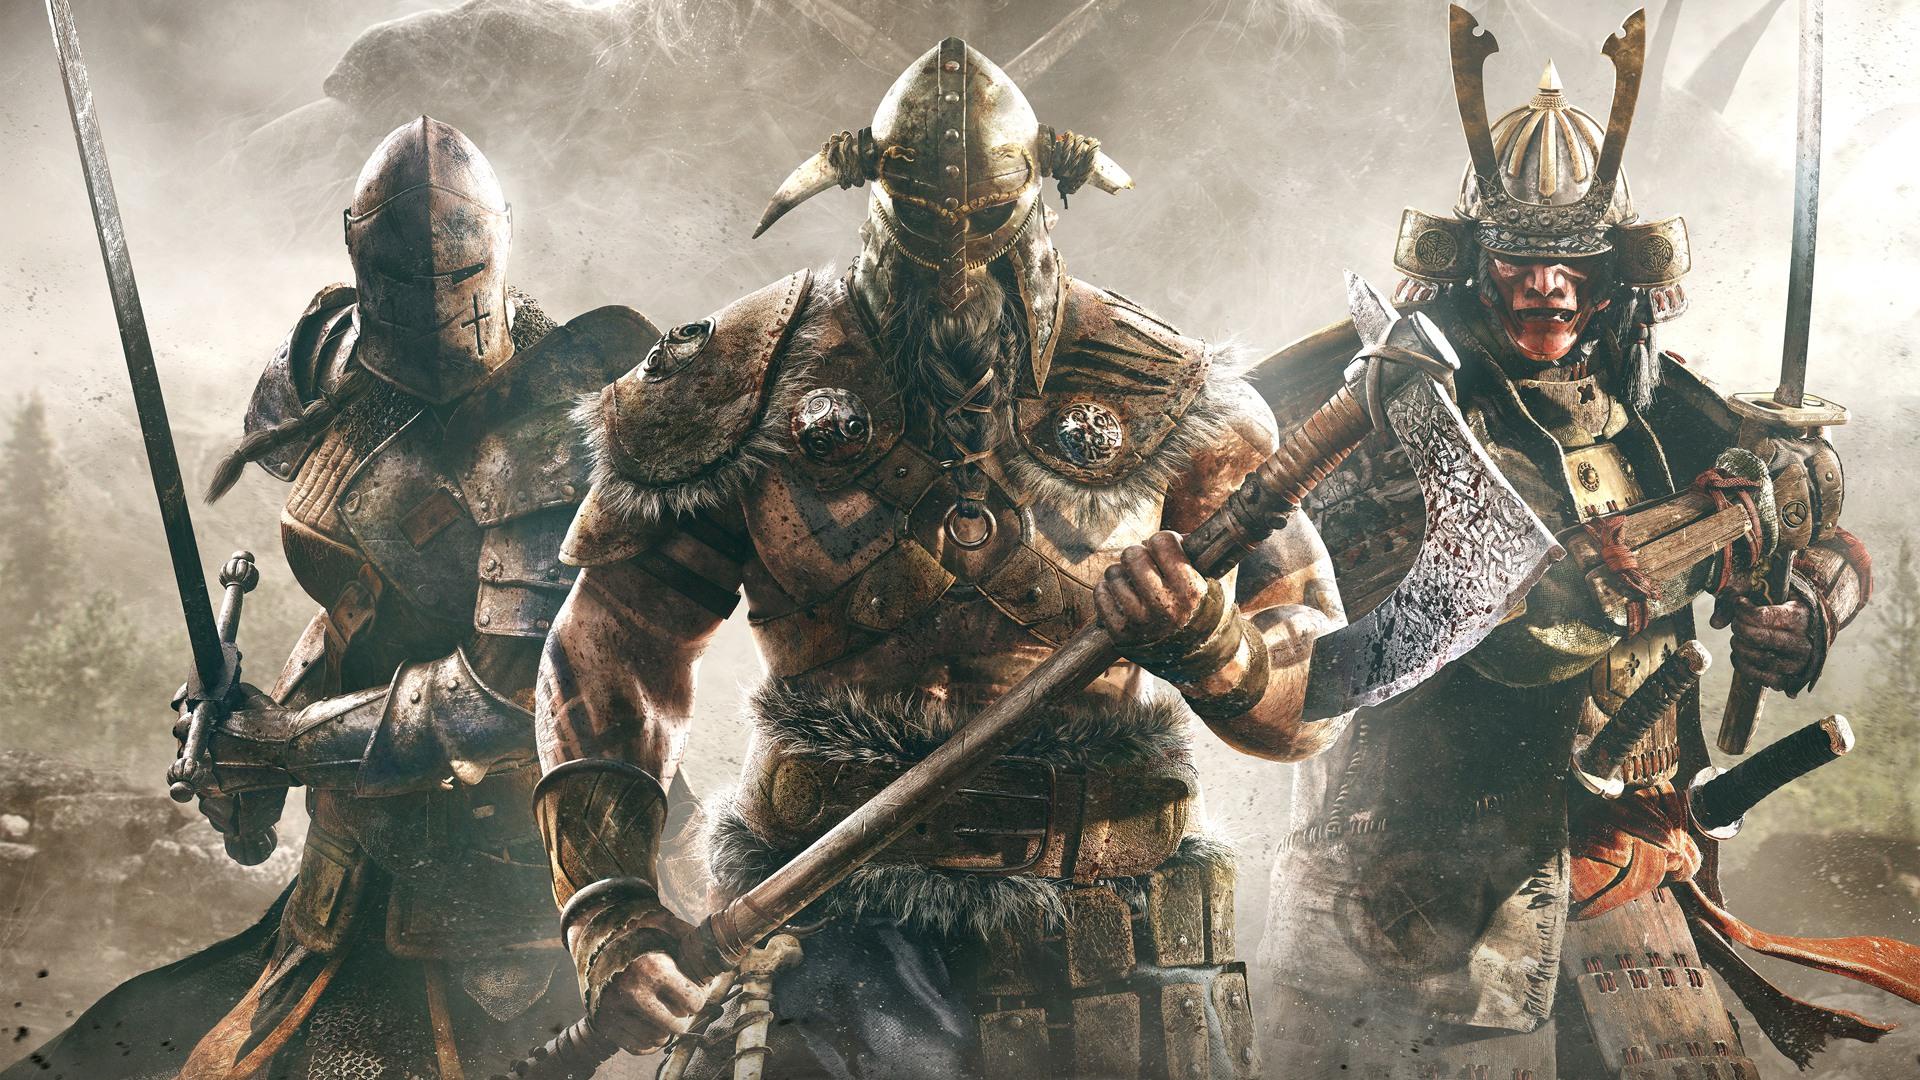 General 1920x1080 video games For Honor knight samurai viking